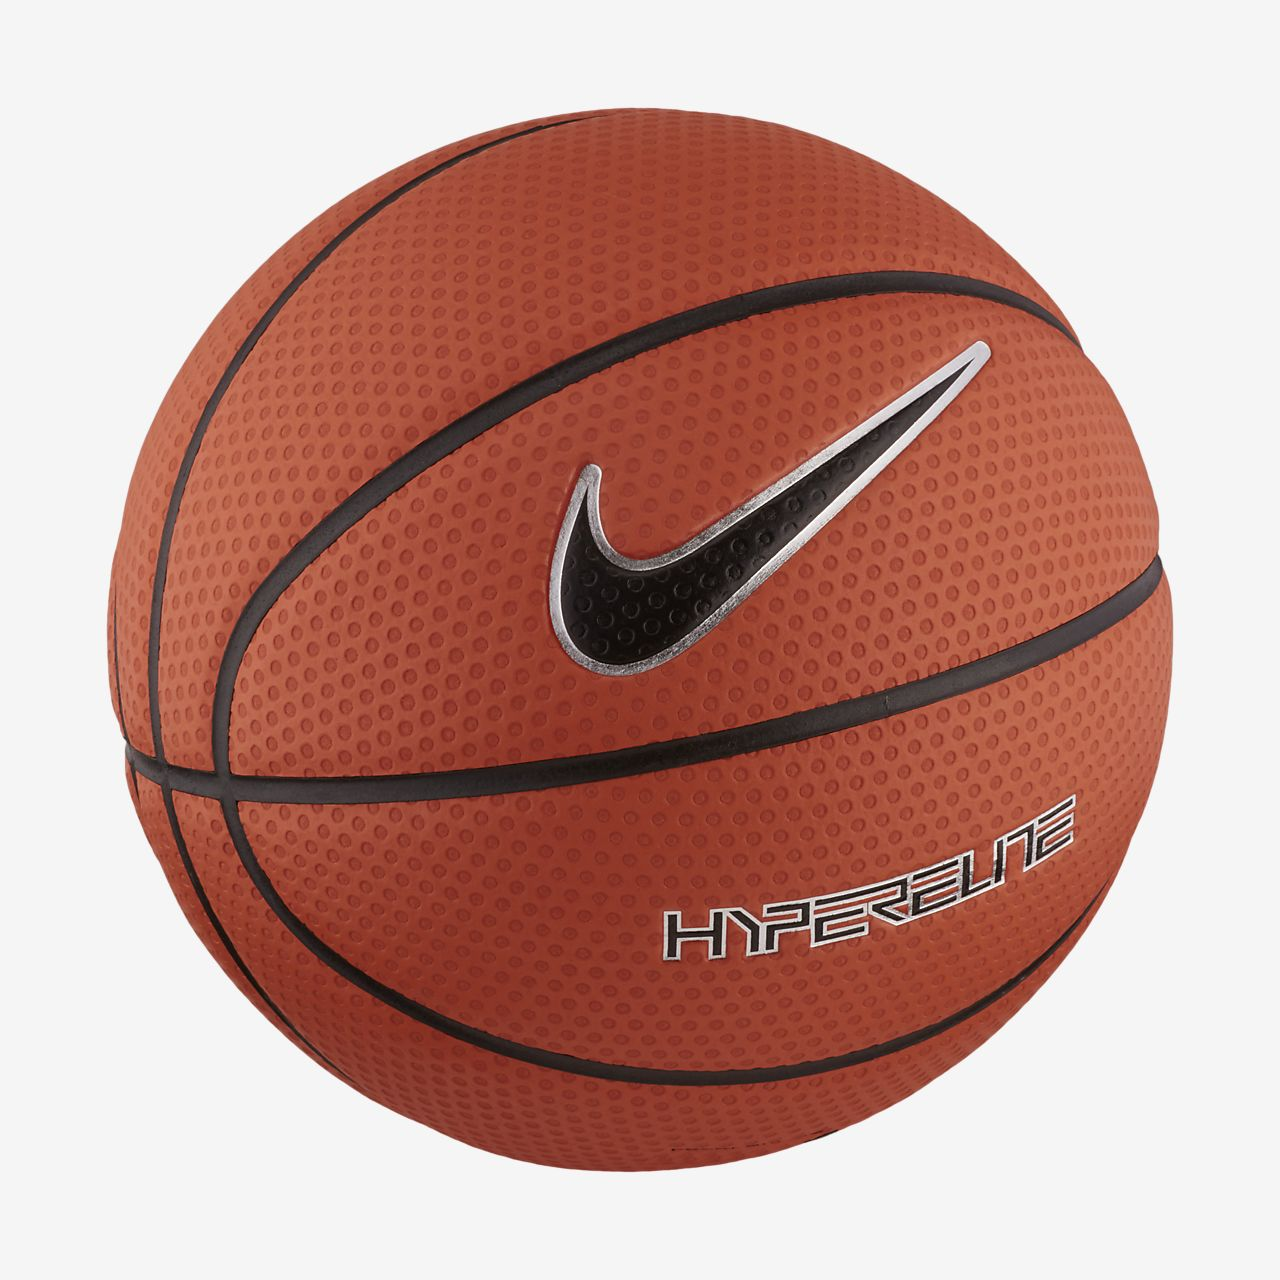 Nike Hyper Elite 8P Basketball Nike com